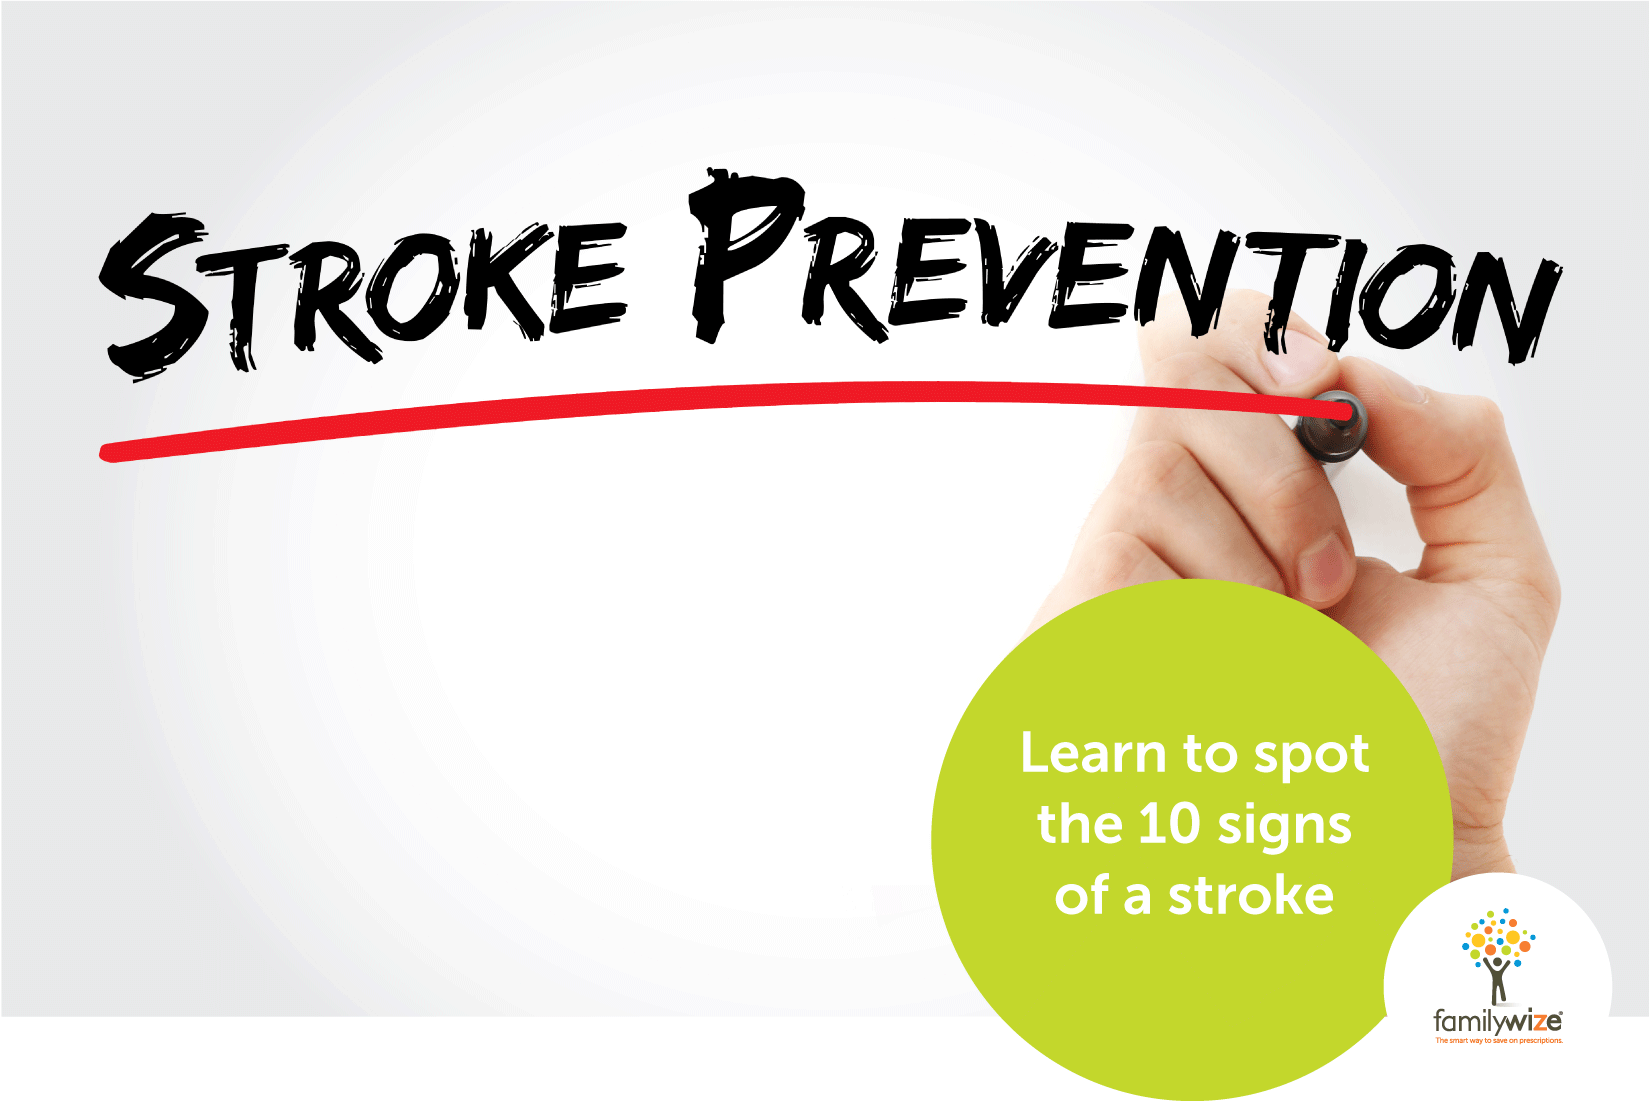 Stroke Prevention Tips